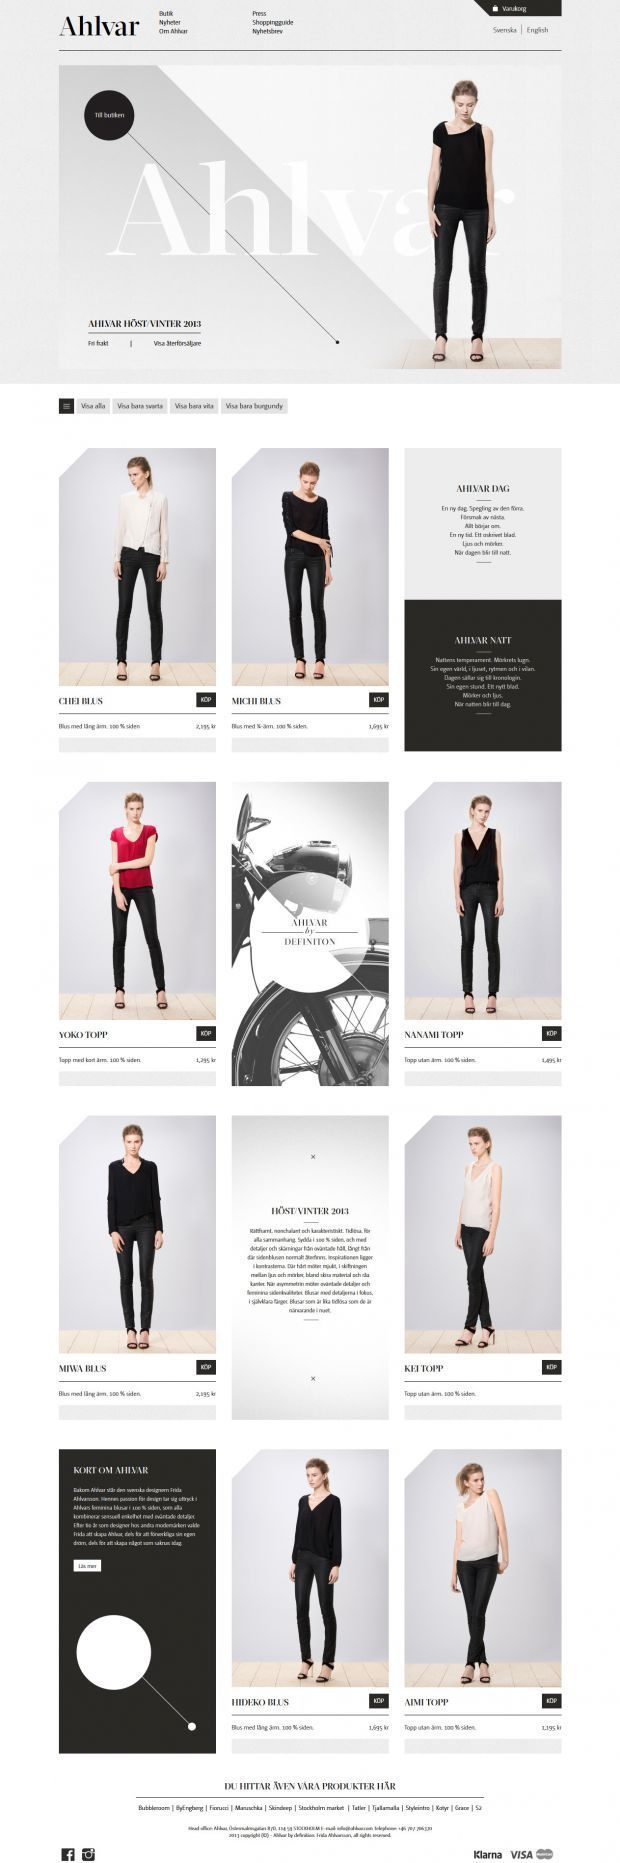 Ahlvar – Web Design | #webdesign #it #web #design #layout #userinterface #website #webdesign